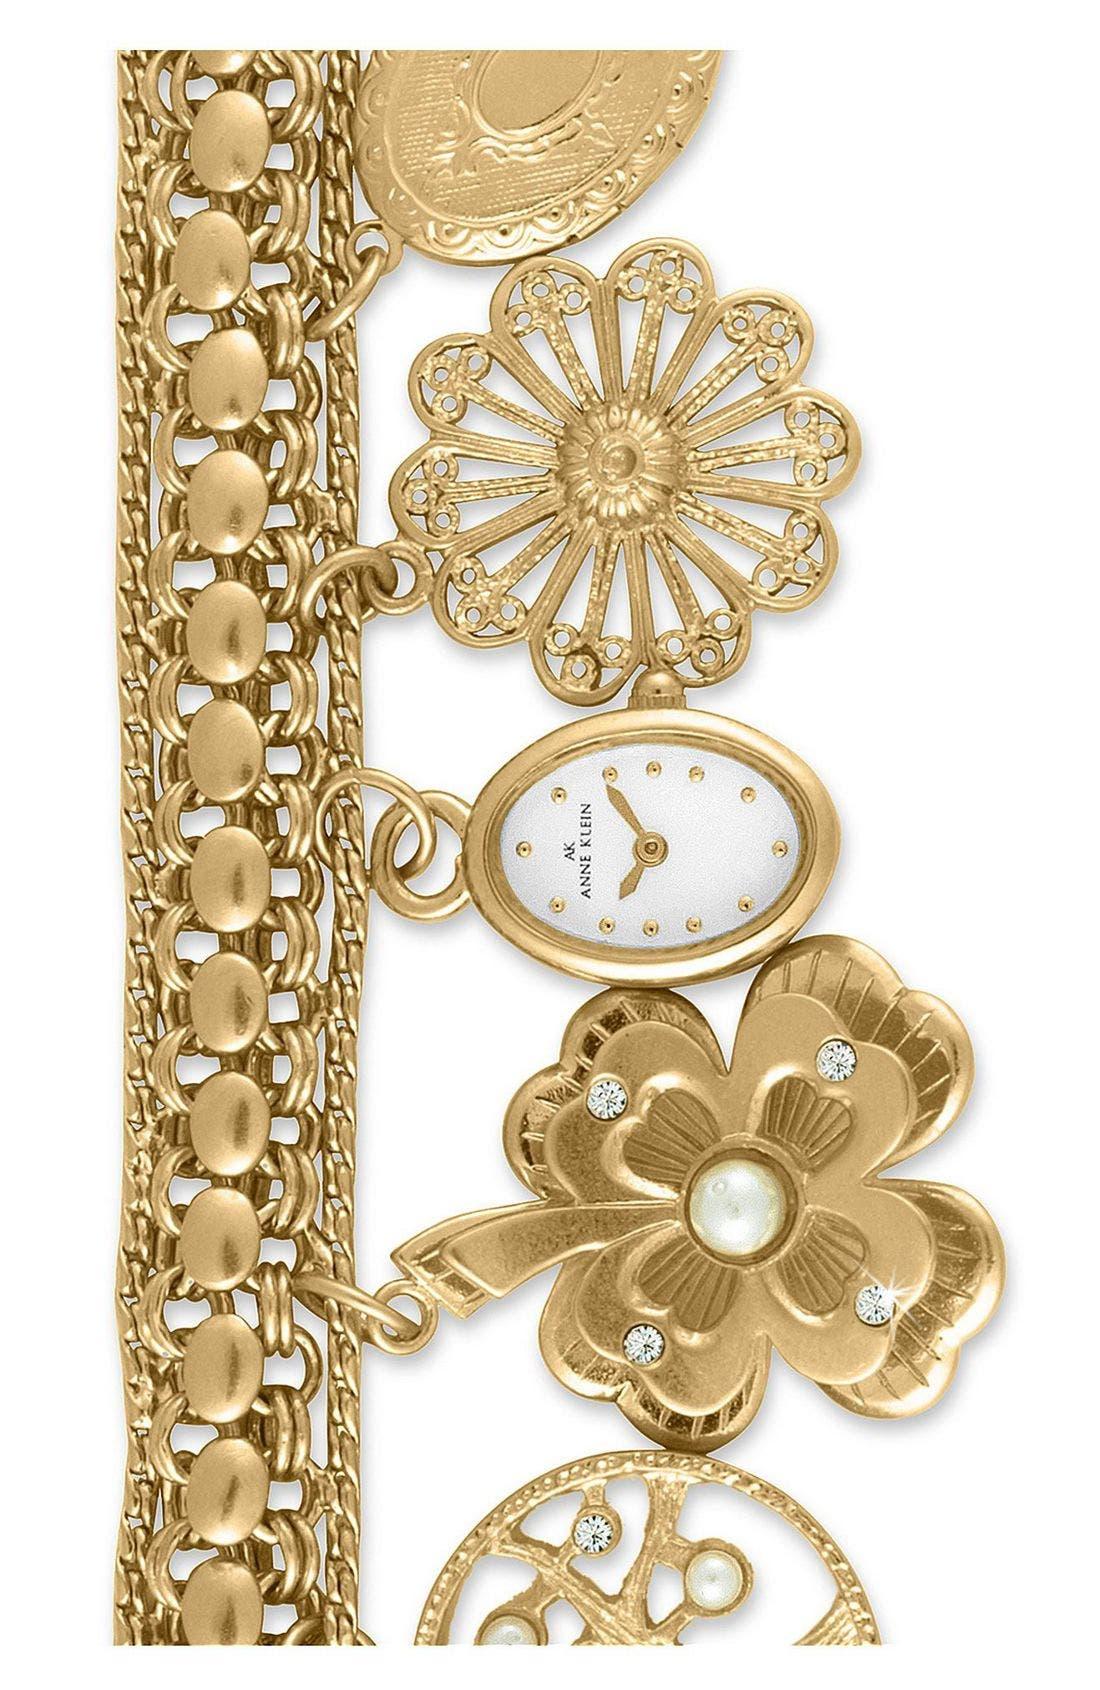 Oval Case Charm Bracelet Watch,                         Main,                         color, Gold